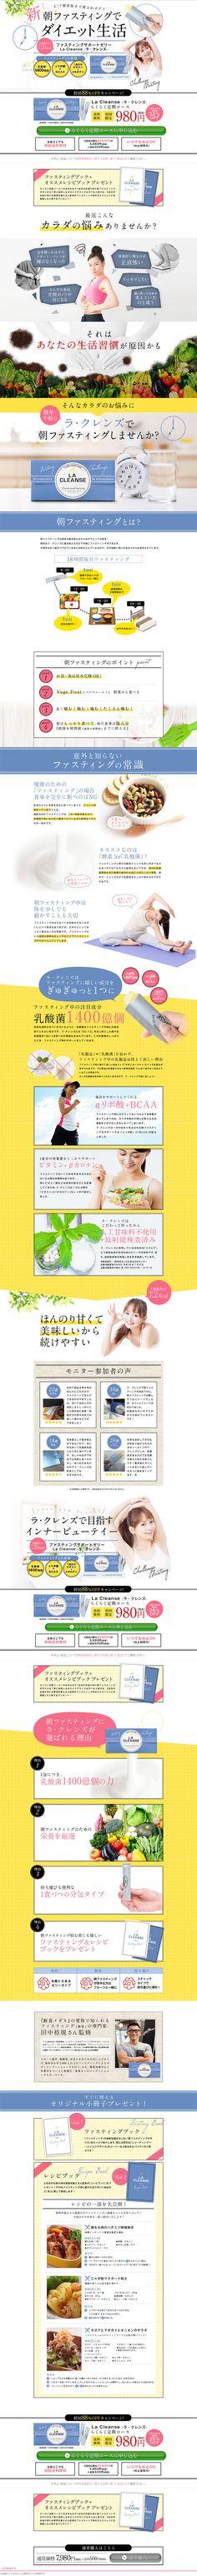 LA CLEANSE【健康・美容食品関連】のLPデザイン。WEBデザイナーさん必見!ランディングページのデザイン参考に(シンプル系)